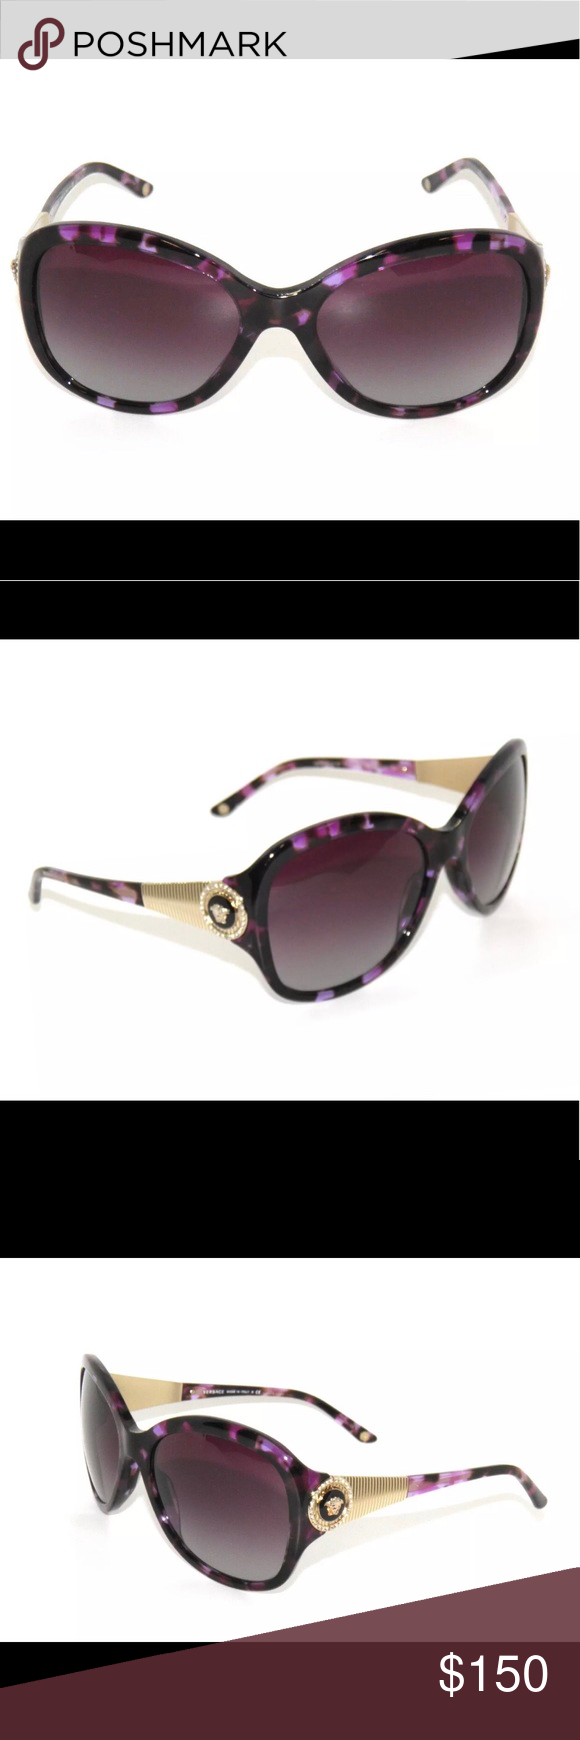 961298283f91 VERSACE Model 4237B Purple Havana Versace Sunglasses MODEL  VE 4237-B  COLOR  5024